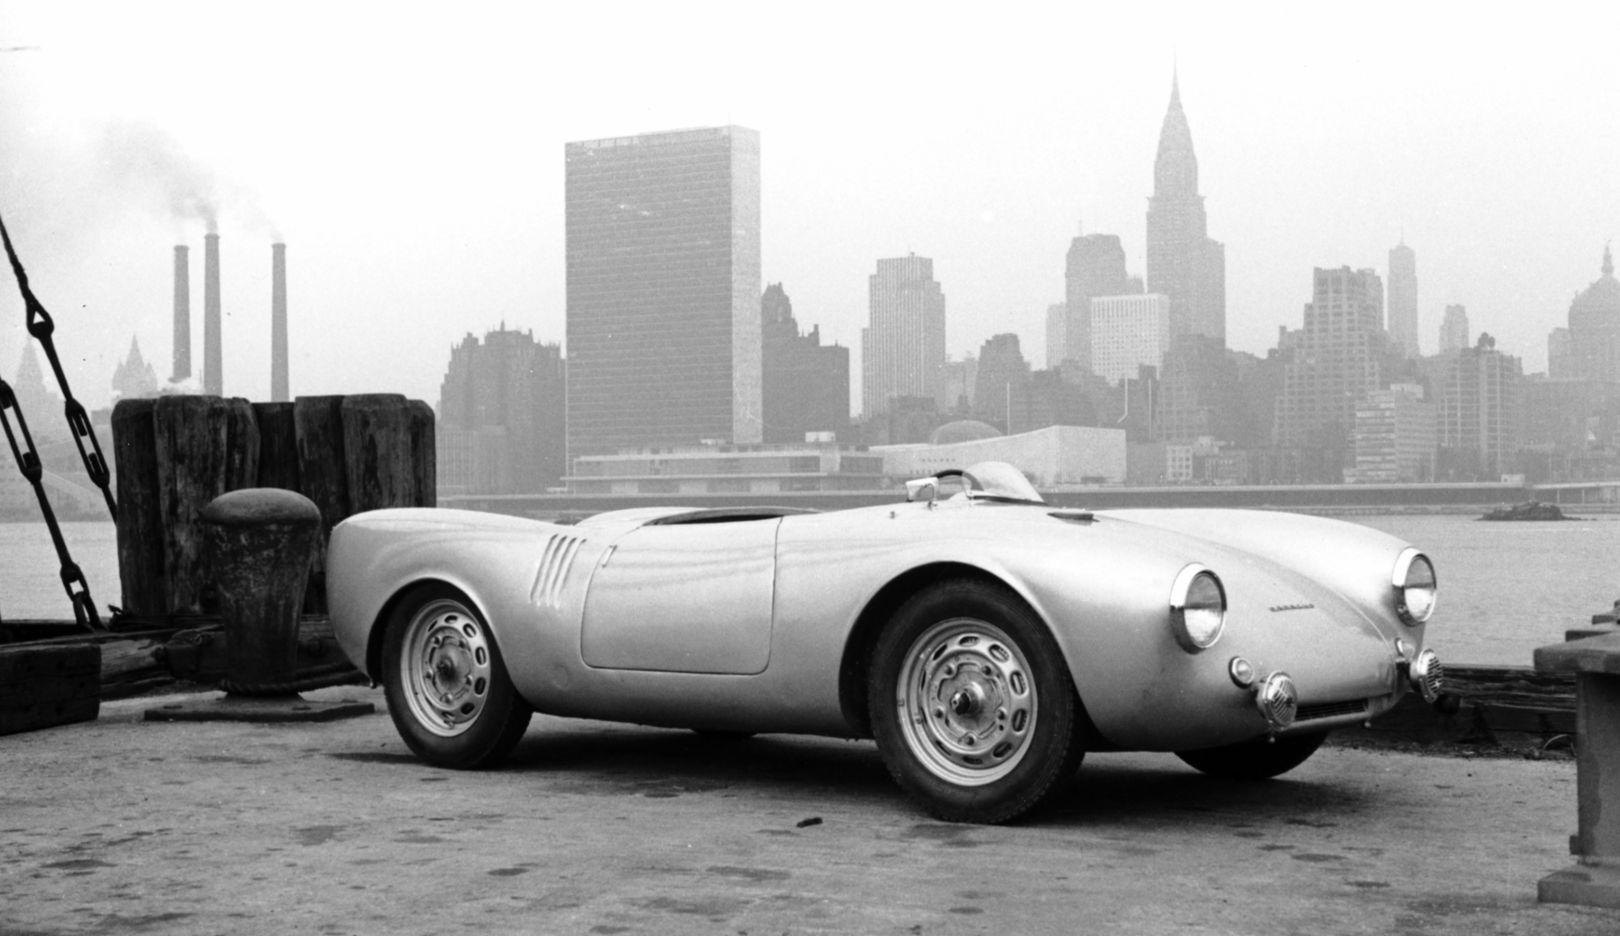 550 Spyder, 1953, Porsche AG